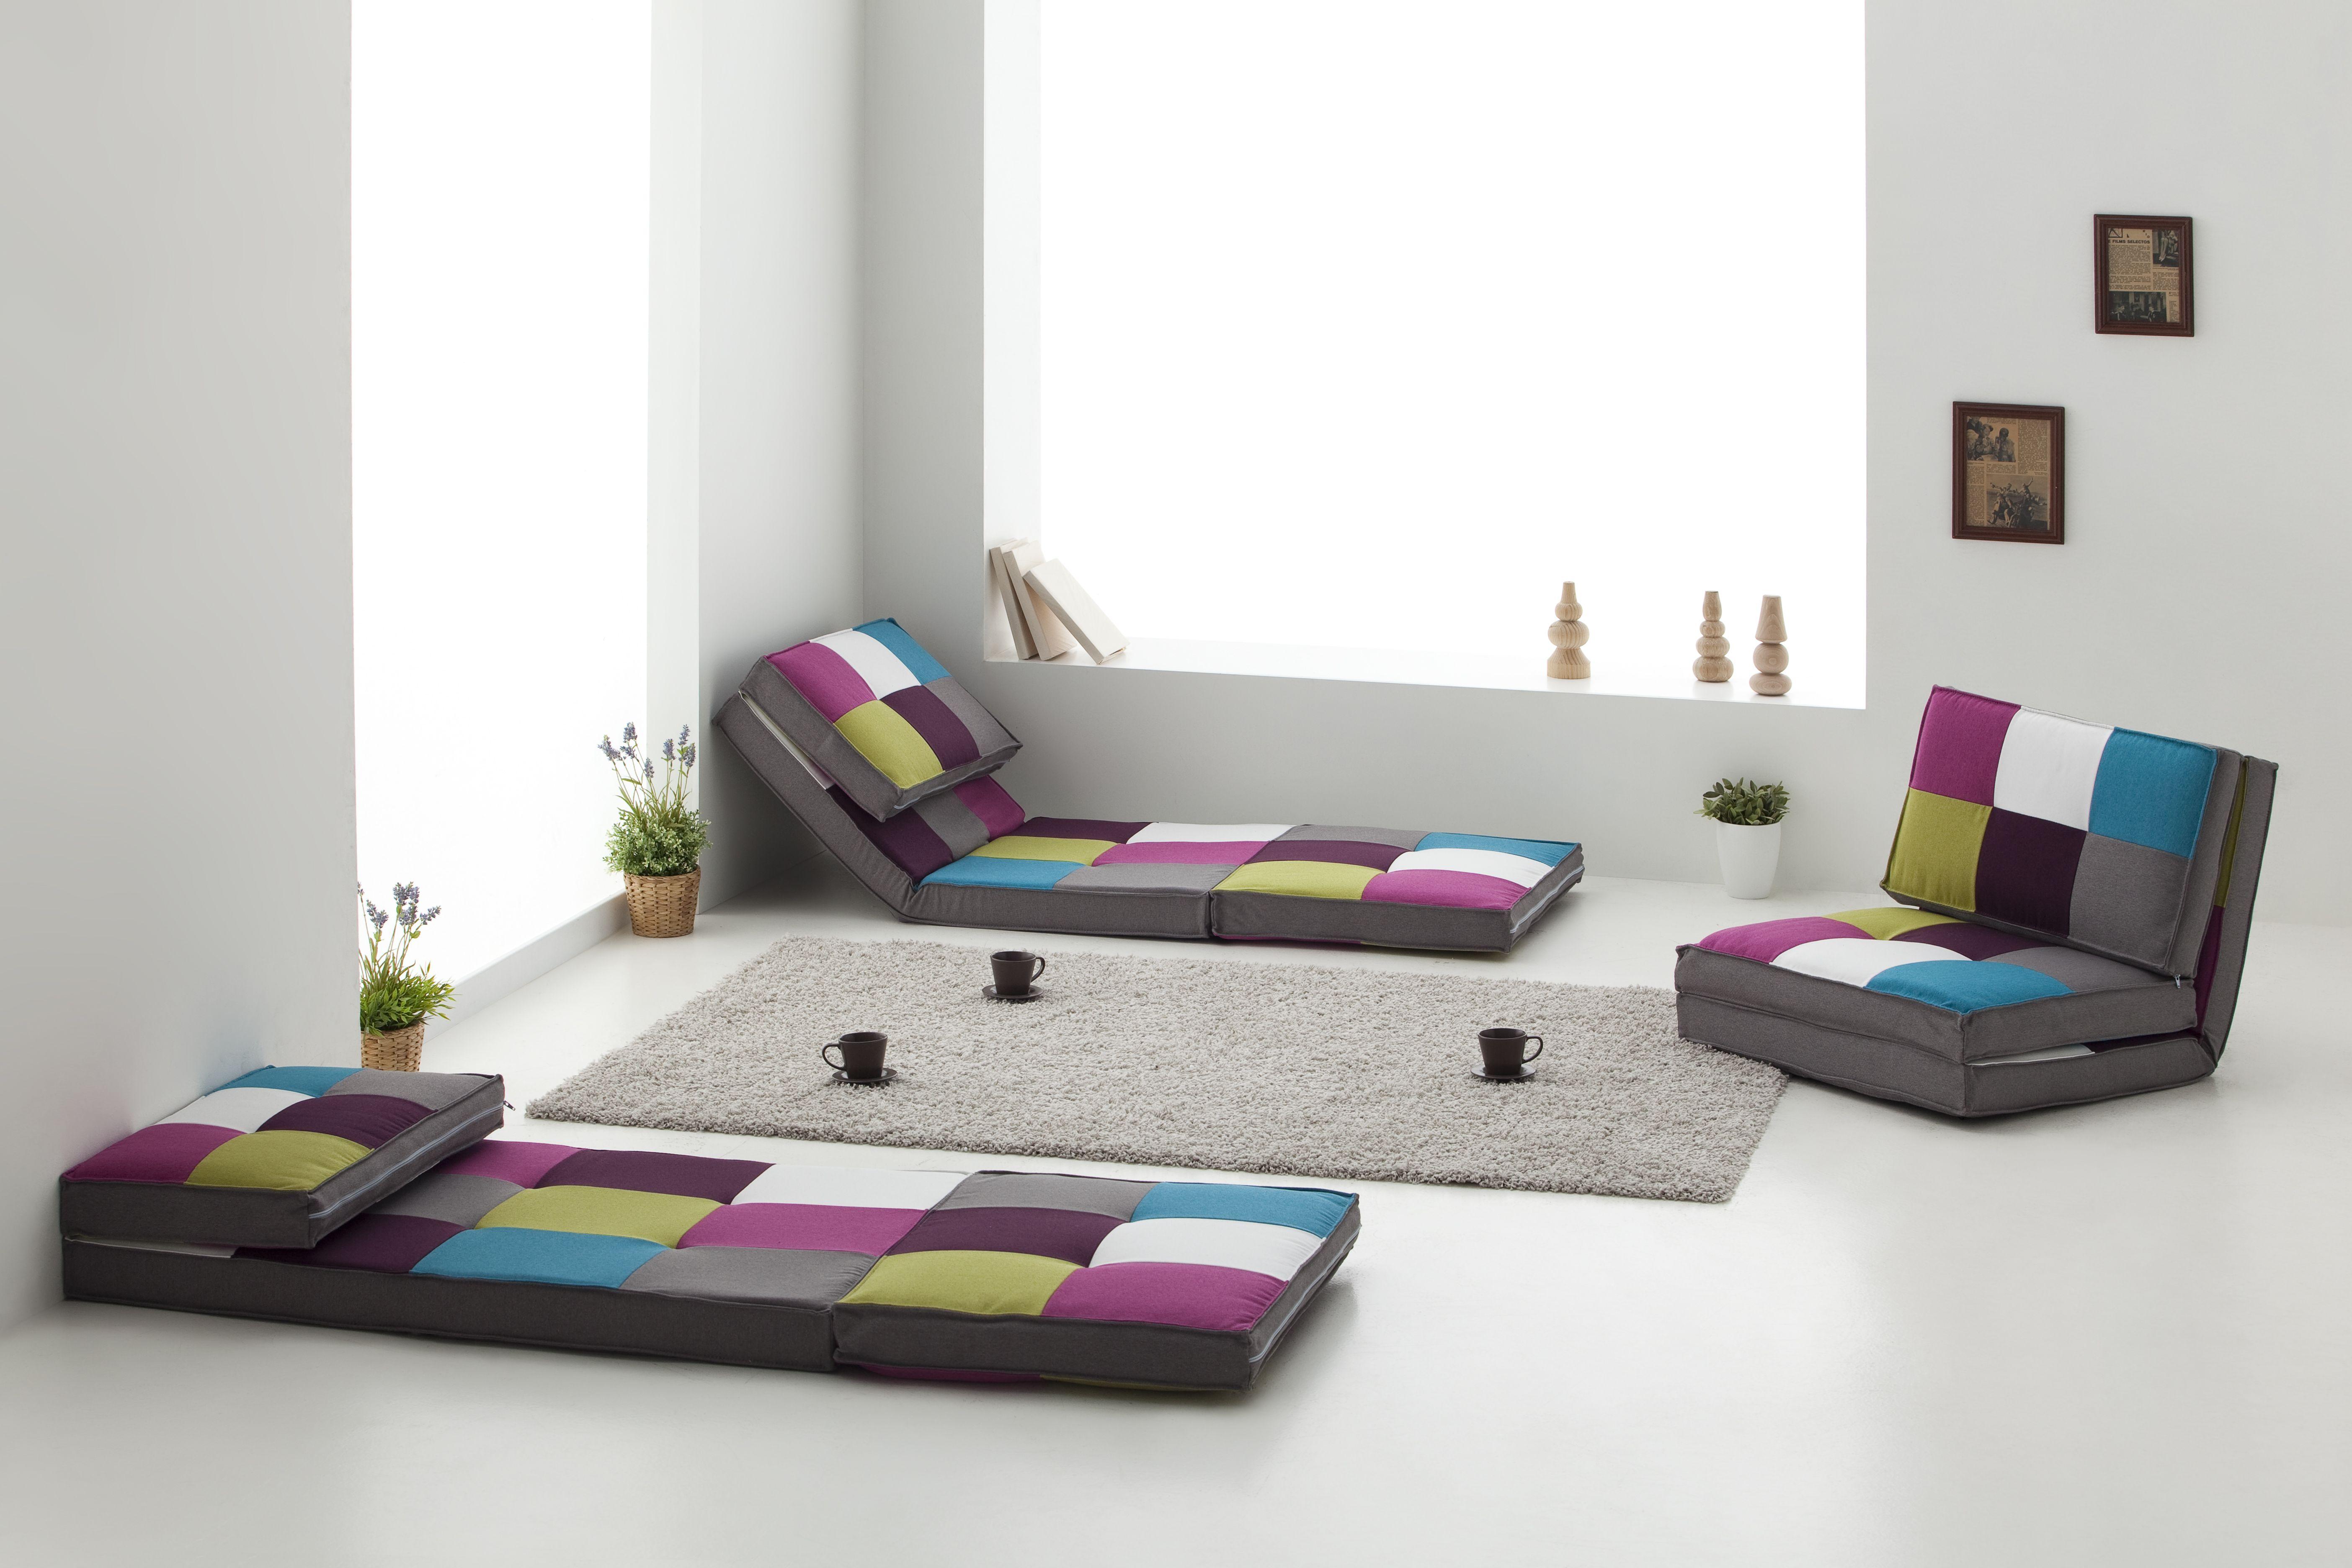 Sof cama barato Magic Pinterest Fabric chairs Ana white and